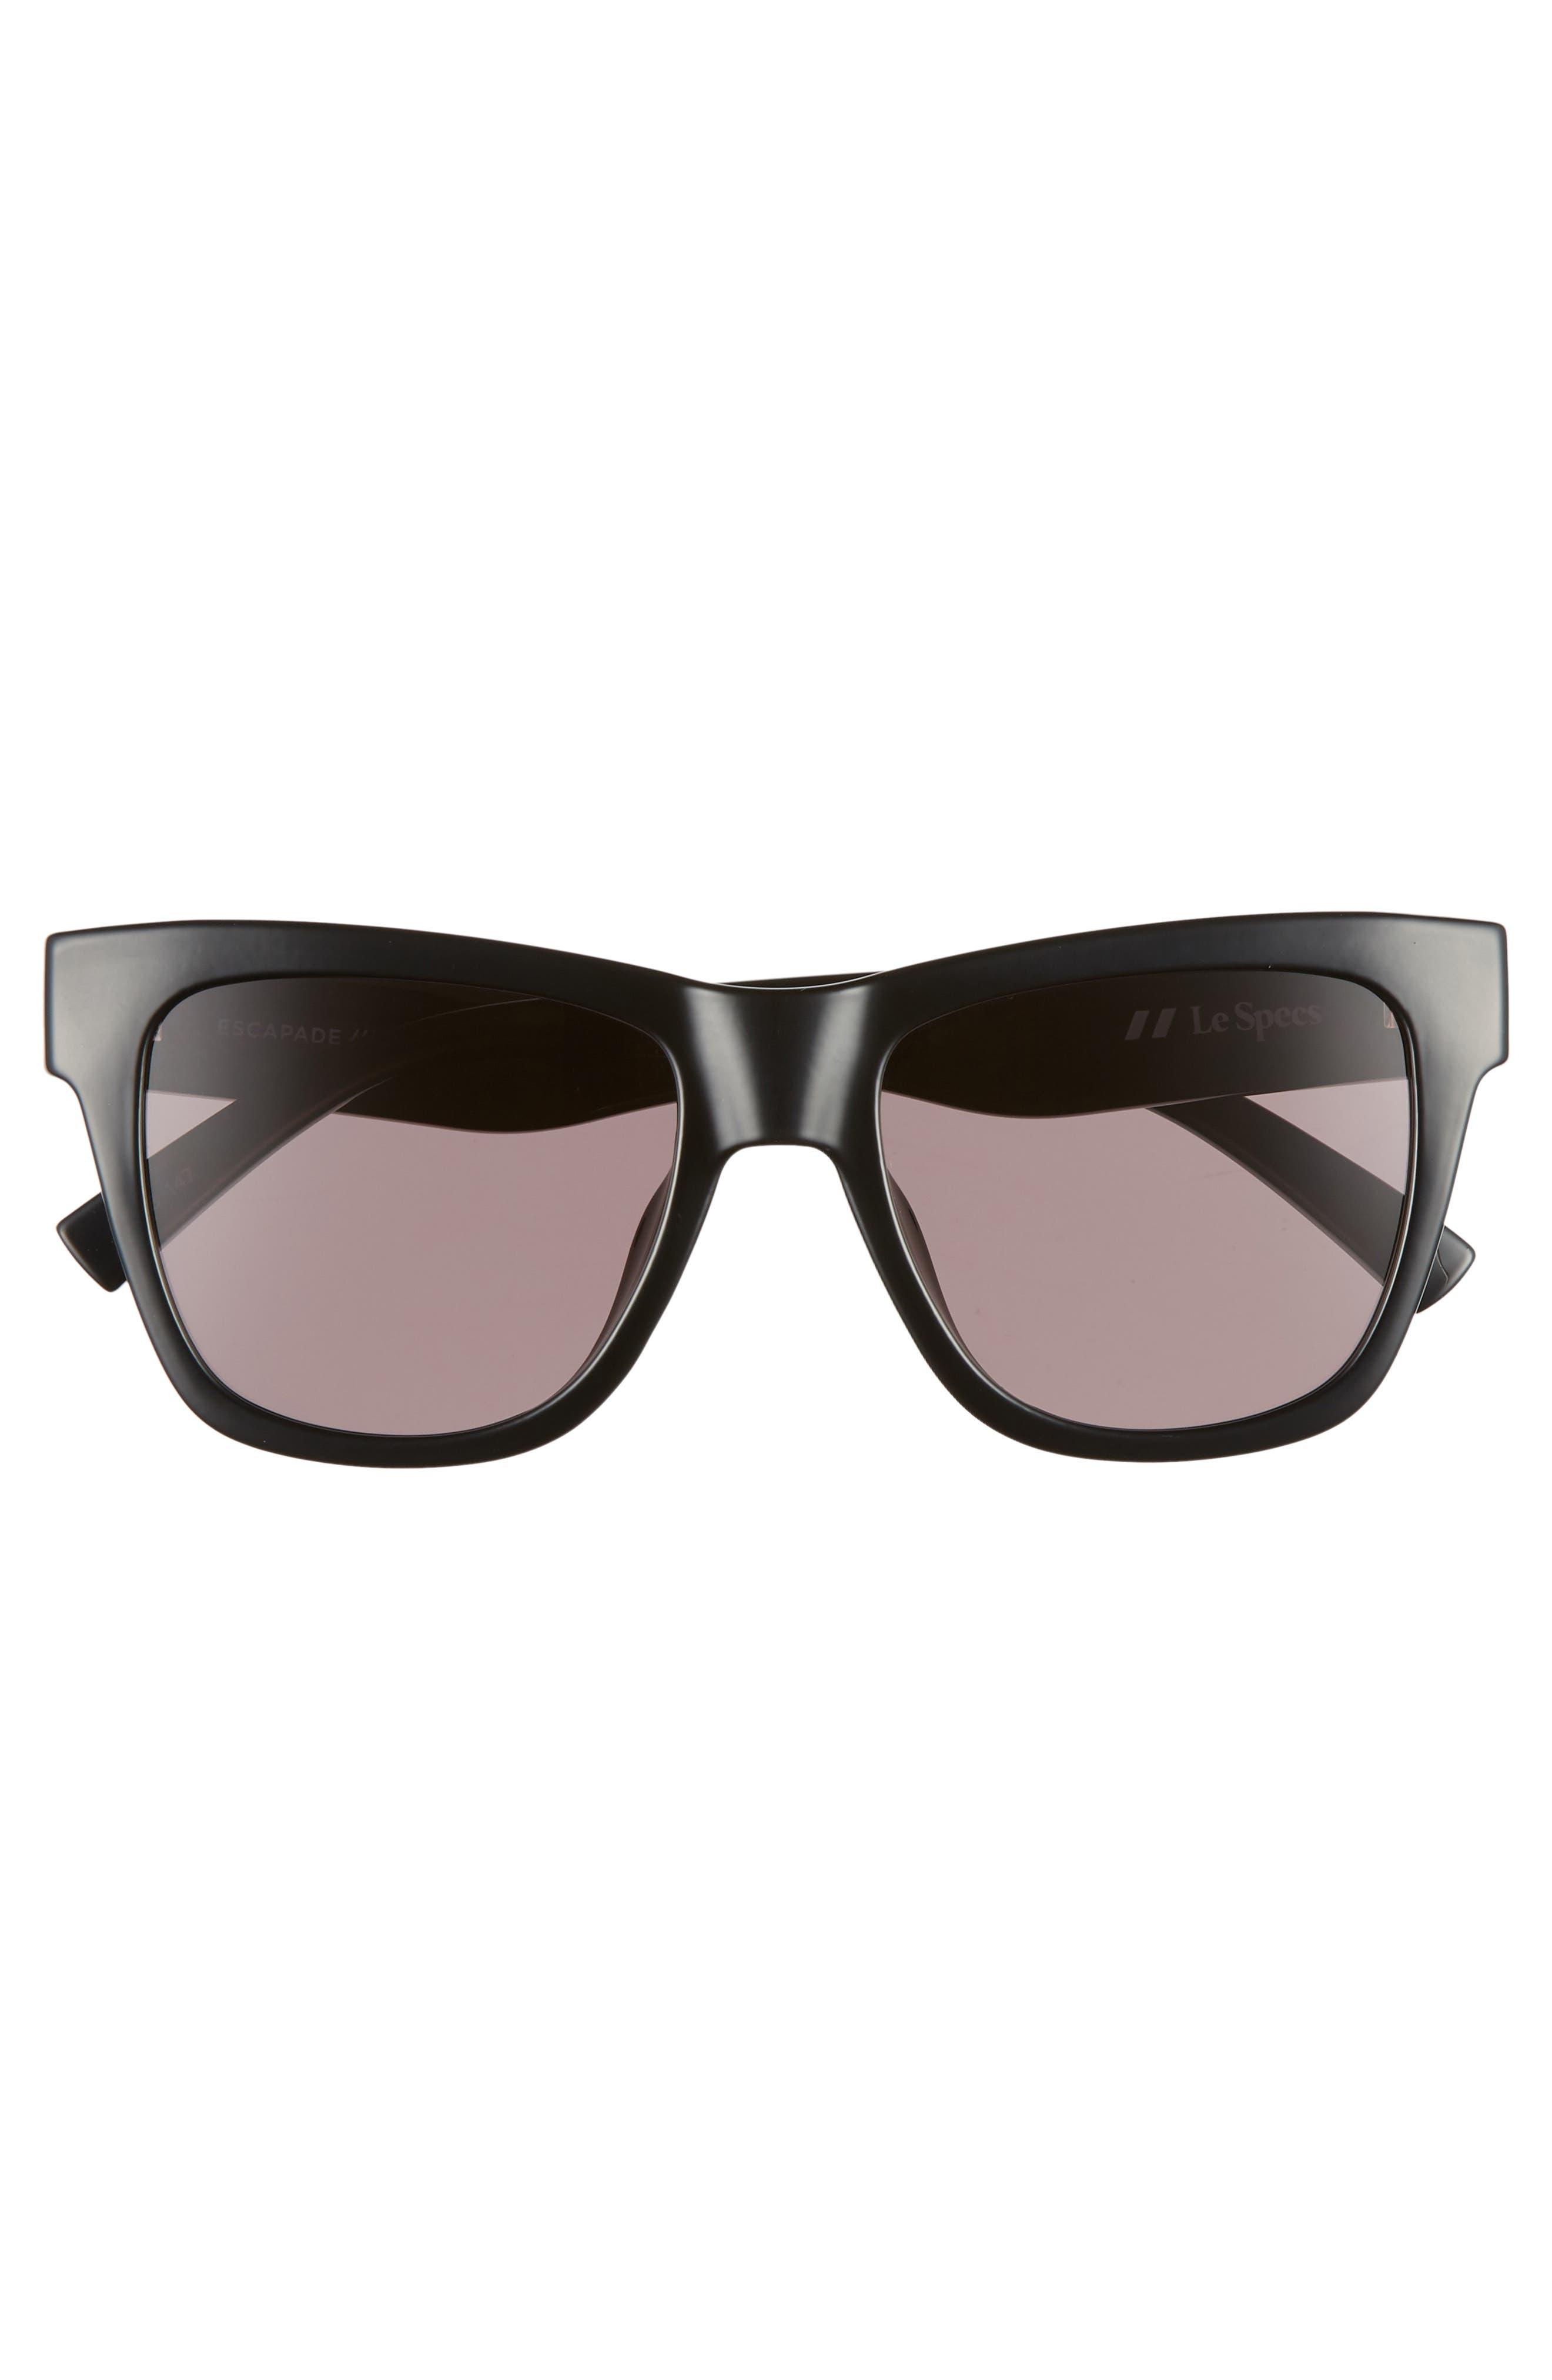 Escapade 54mm Sunglasses,                             Alternate thumbnail 3, color,                             BLACK